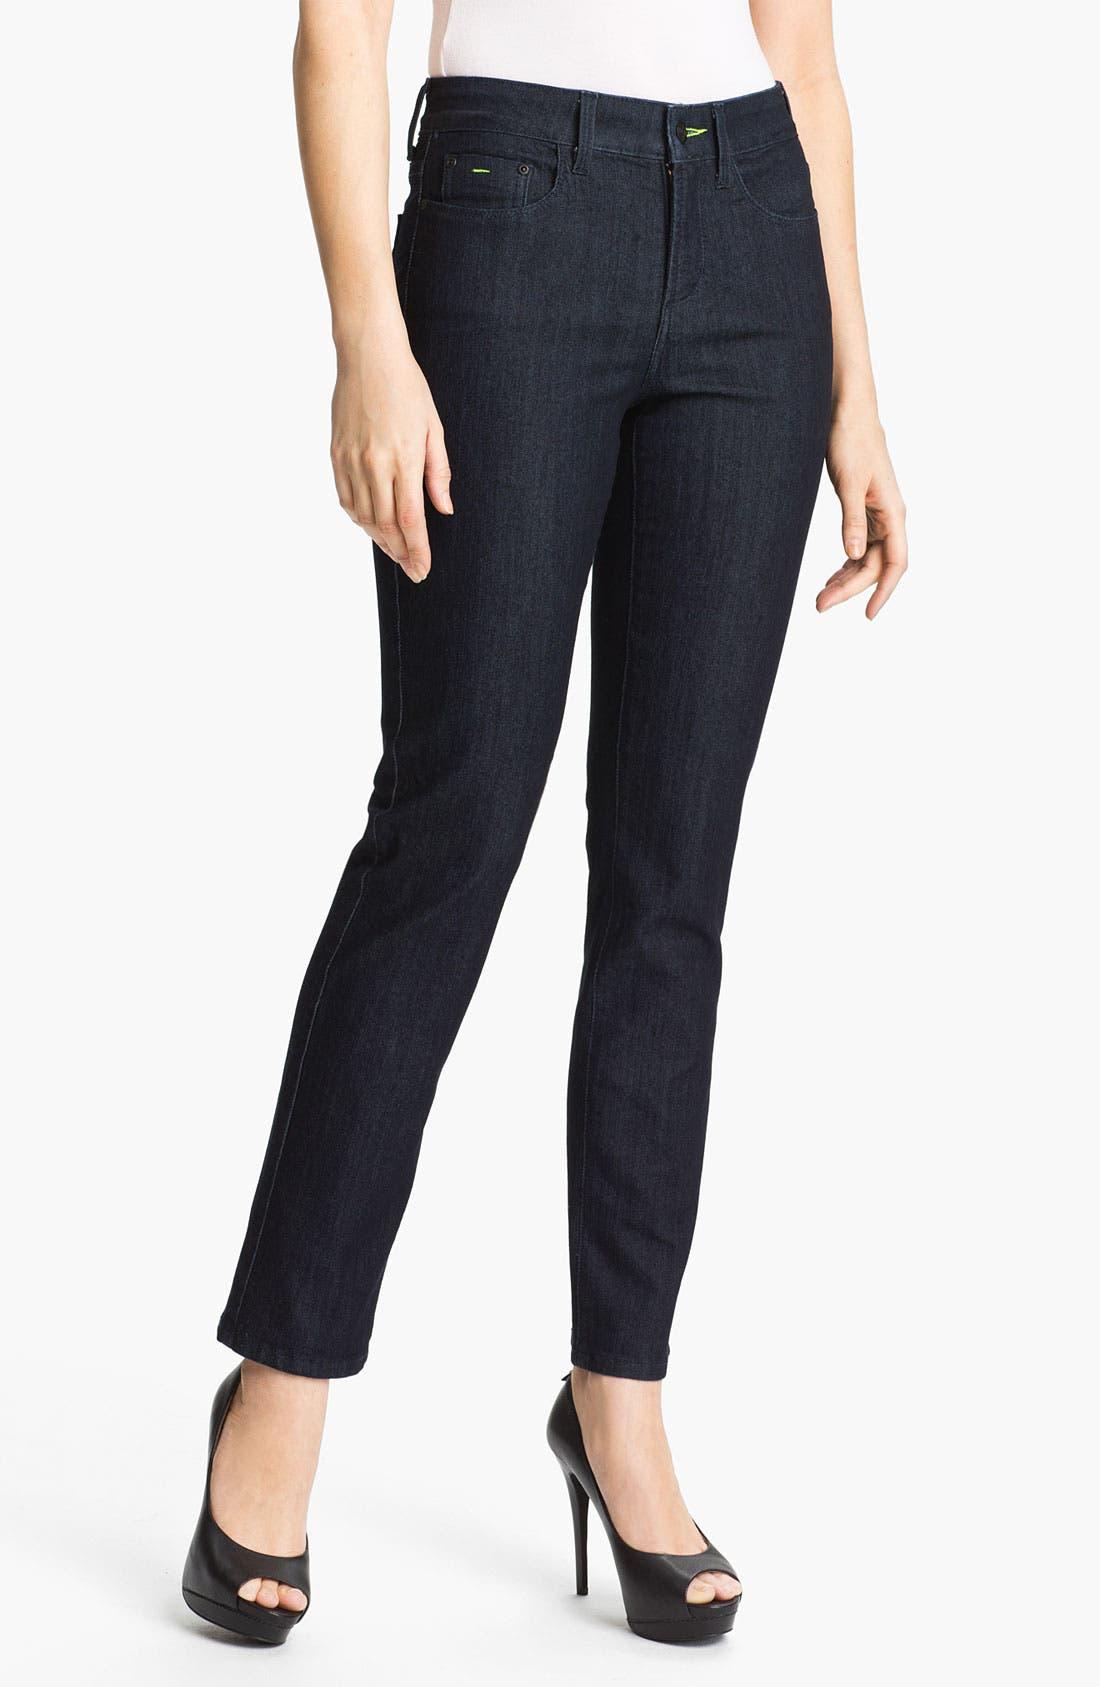 Alternate Image 1 Selected - NYDJ 'Sheri' Neon Stitch Skinny Stretch Jeans